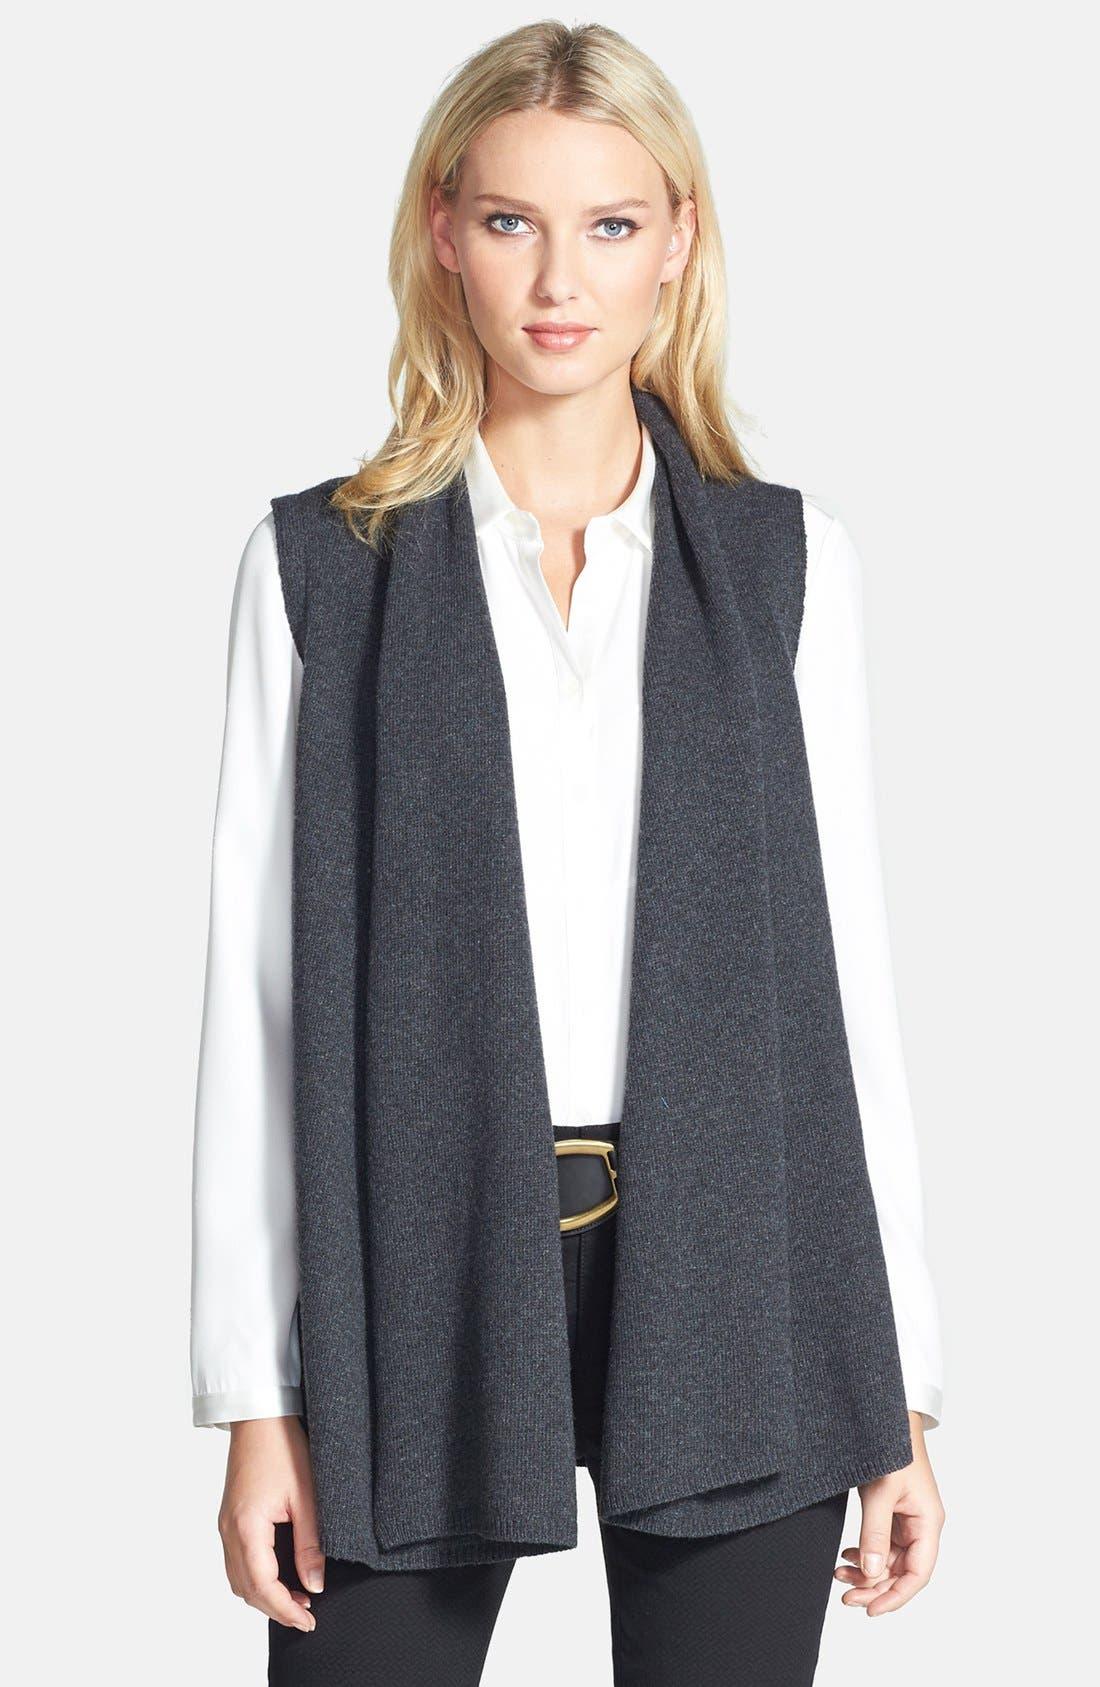 Alternate Image 1 Selected - Lafayette 148 New York Leather Back Merino & Cashmere Vest (Plus Size)